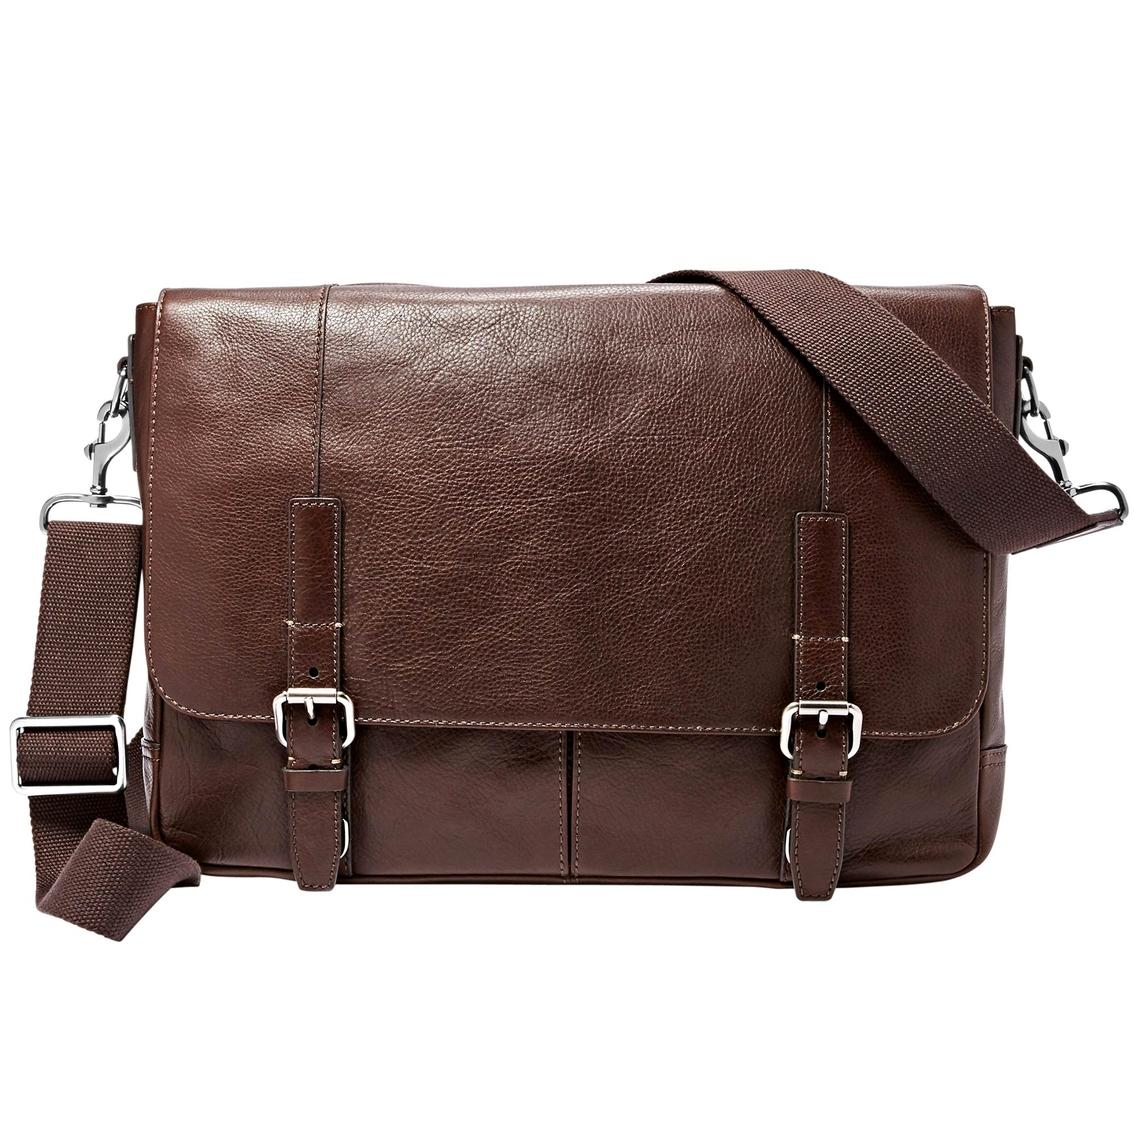 Fossil Graham East West Messenger Bag | Business Cases | More | Shop The Exchange